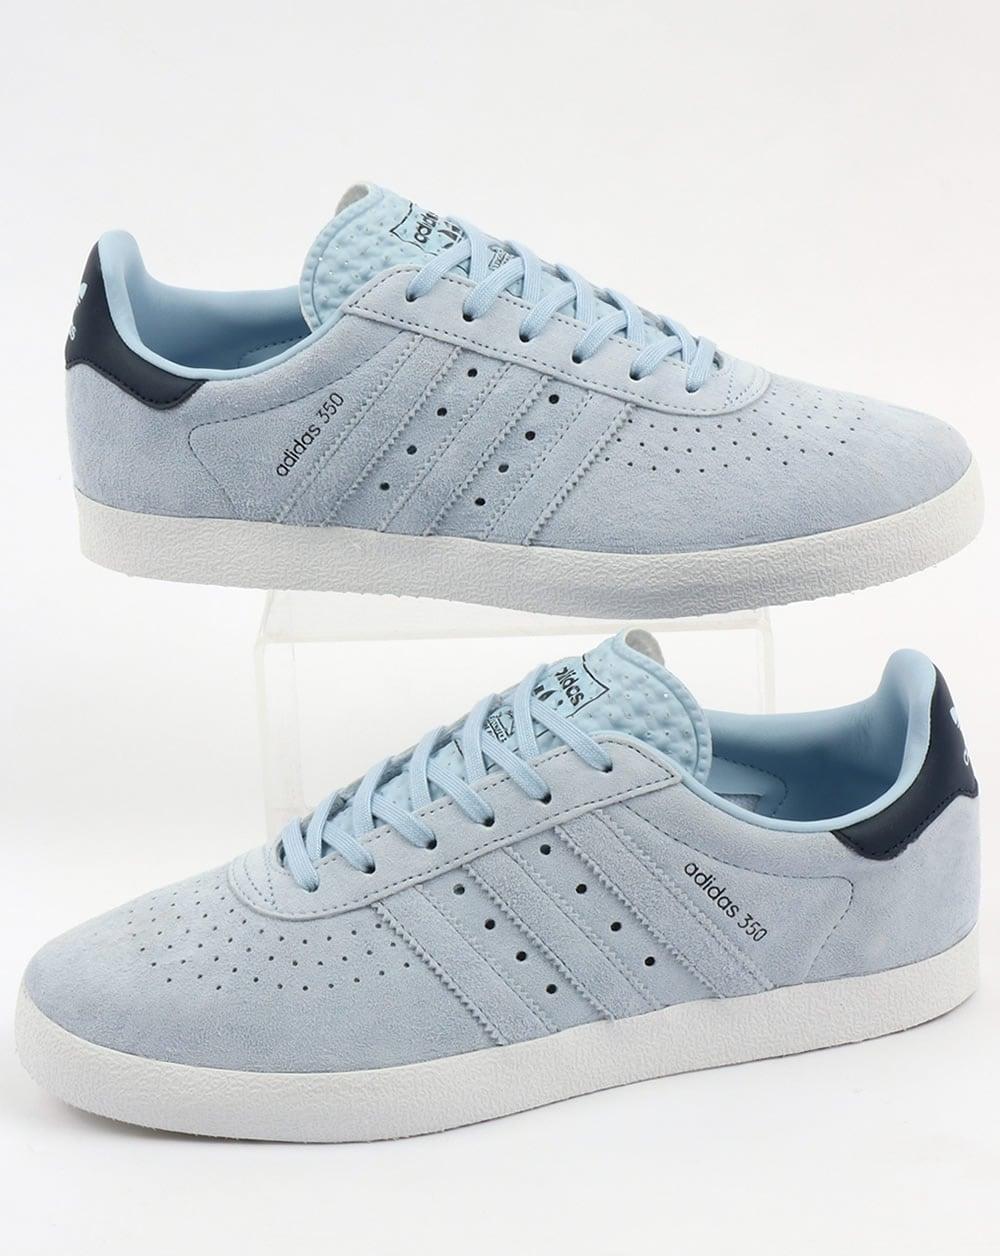 Adidas 350 Trainers Sky, Blue,shoes